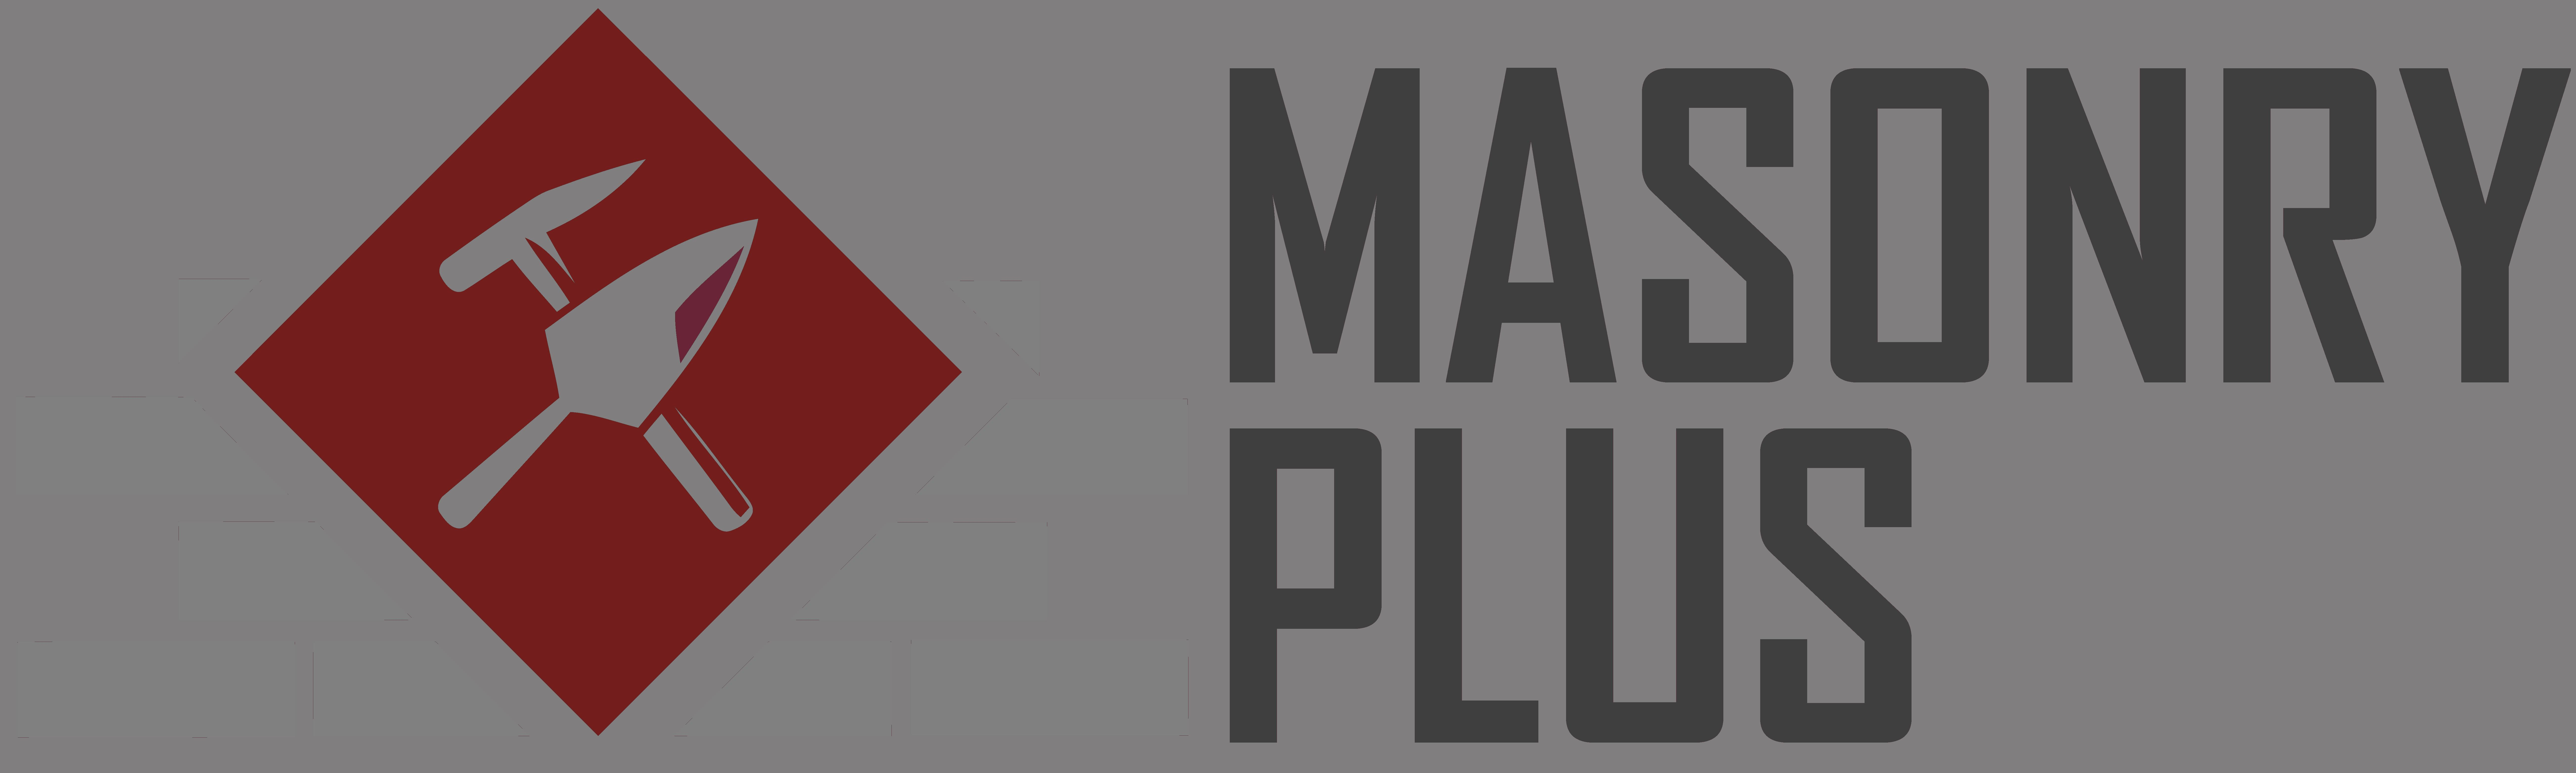 Masonry Plus | Expert Masonry, Cement, Brick, and Parging